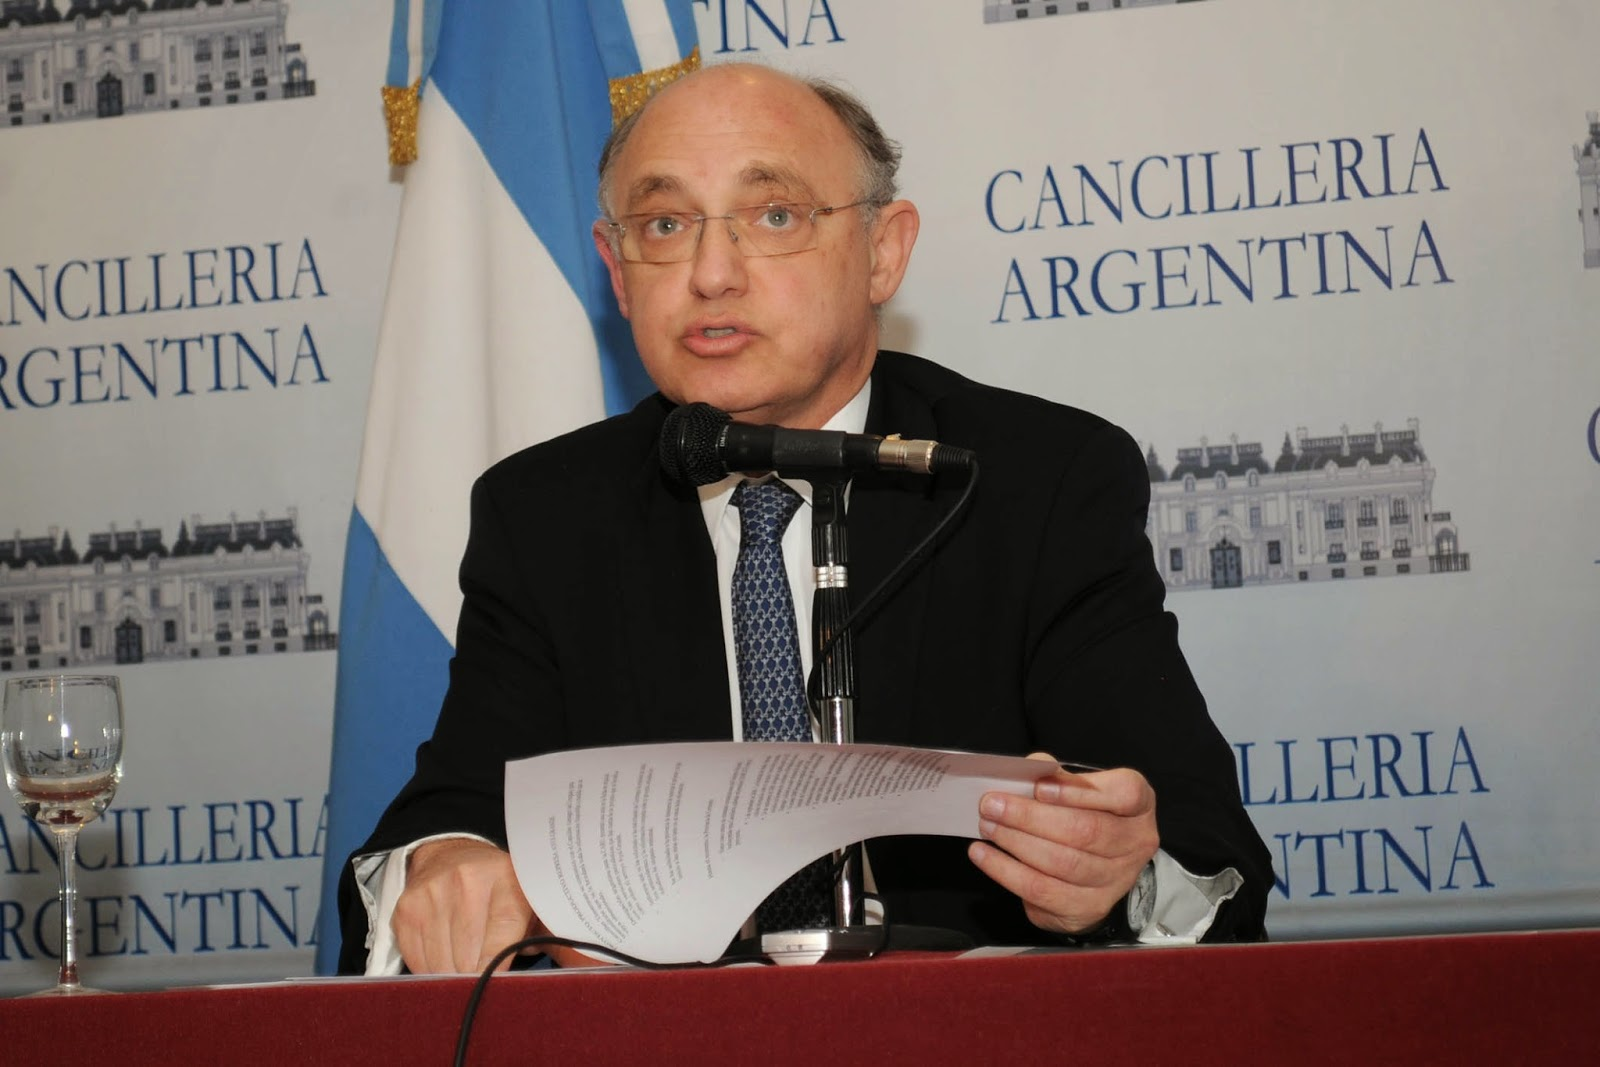 Chanceler judeu argentino deixa Amia